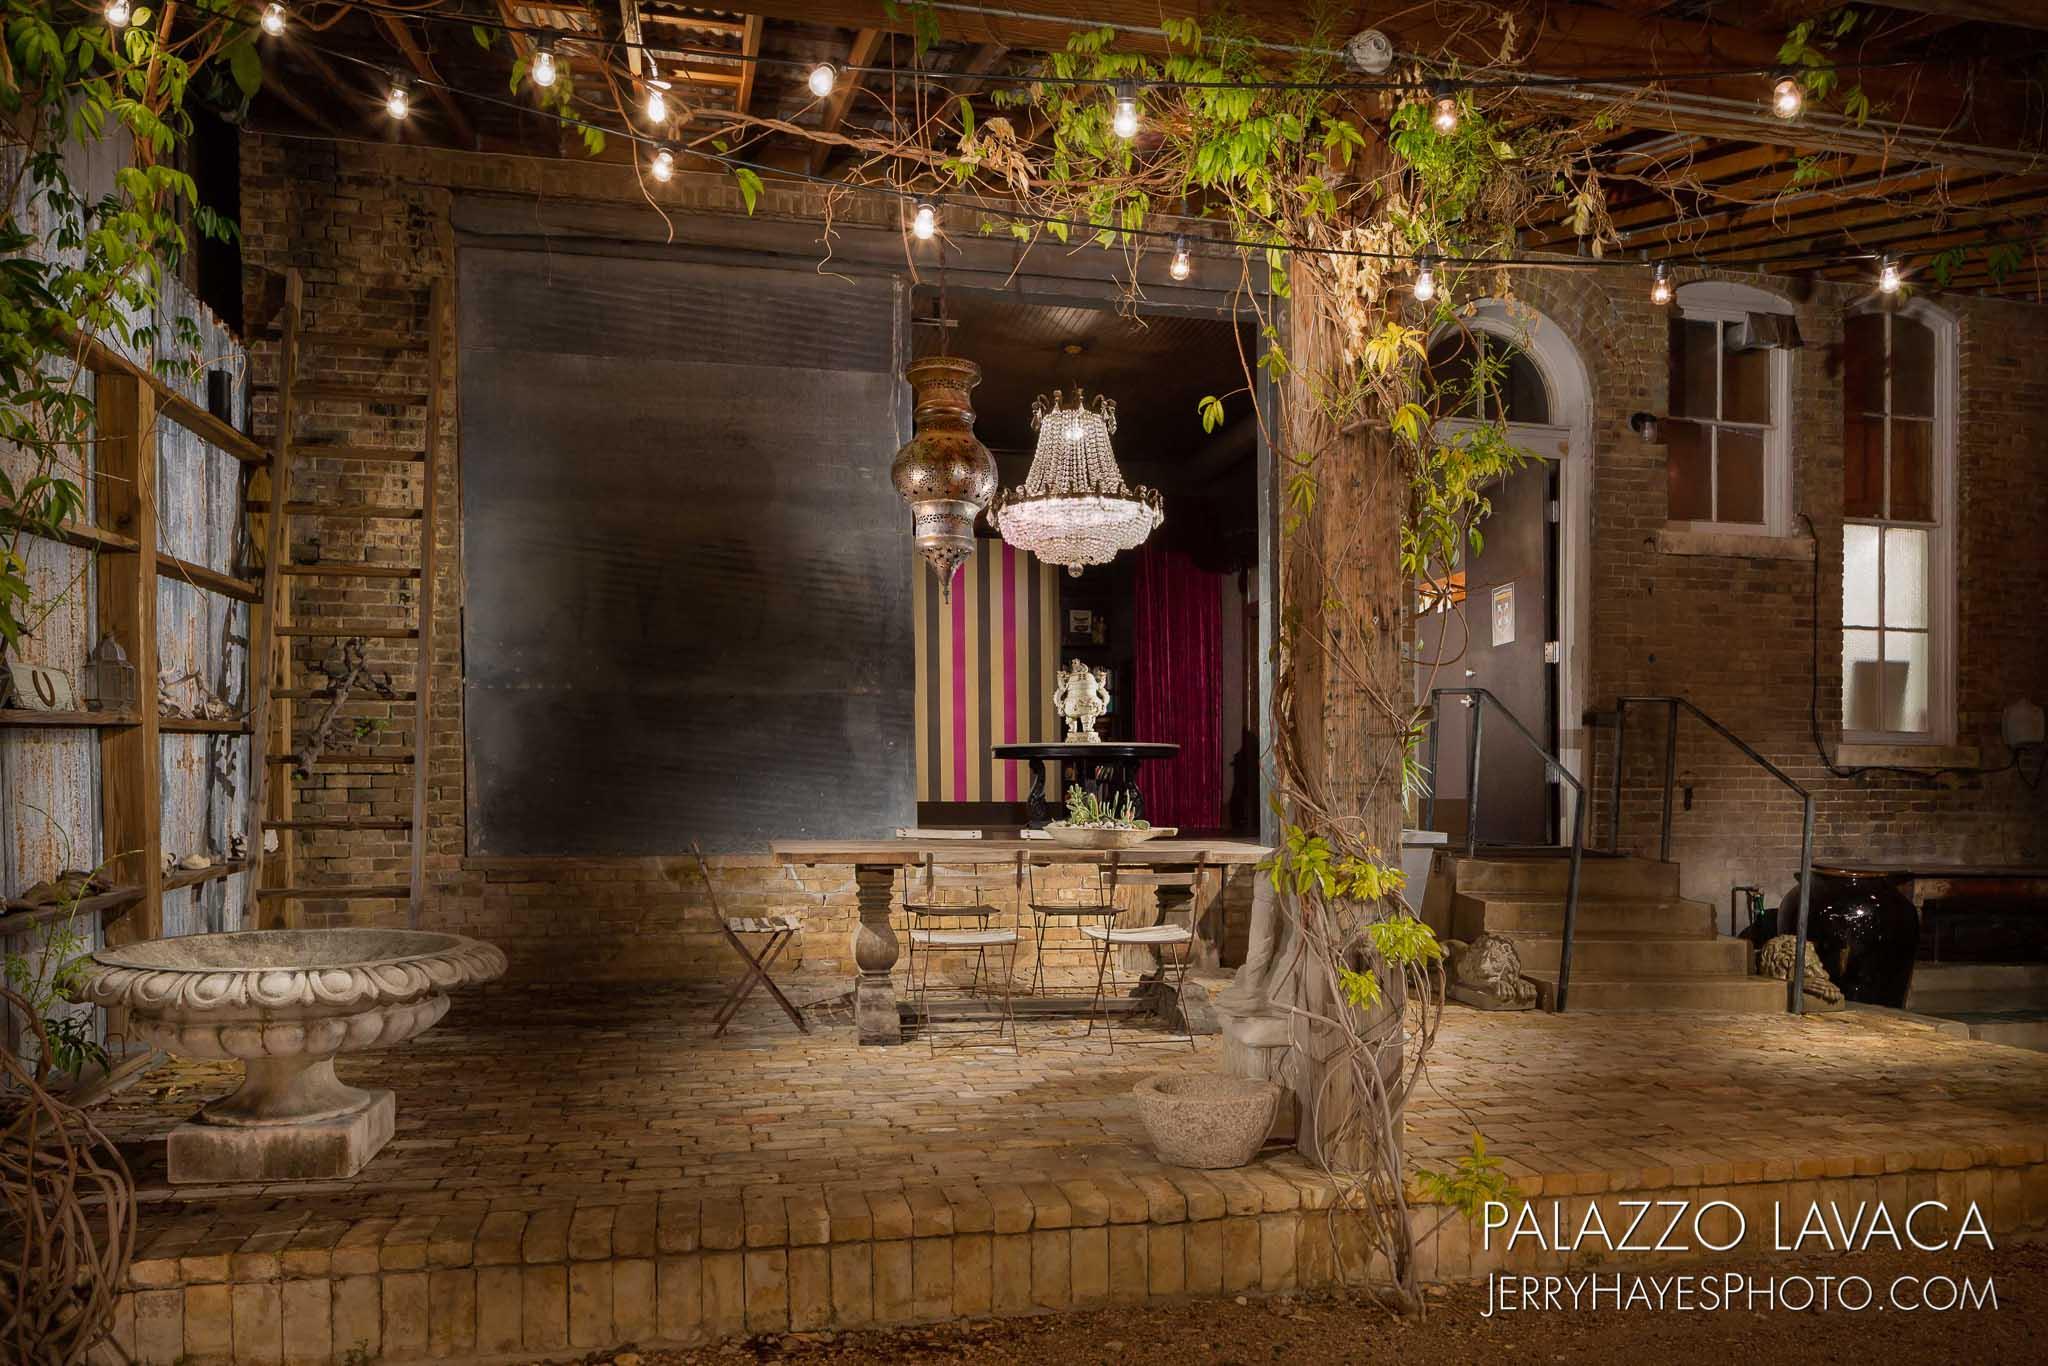 PalazzoLavacaJuly2016-7-4.jpg